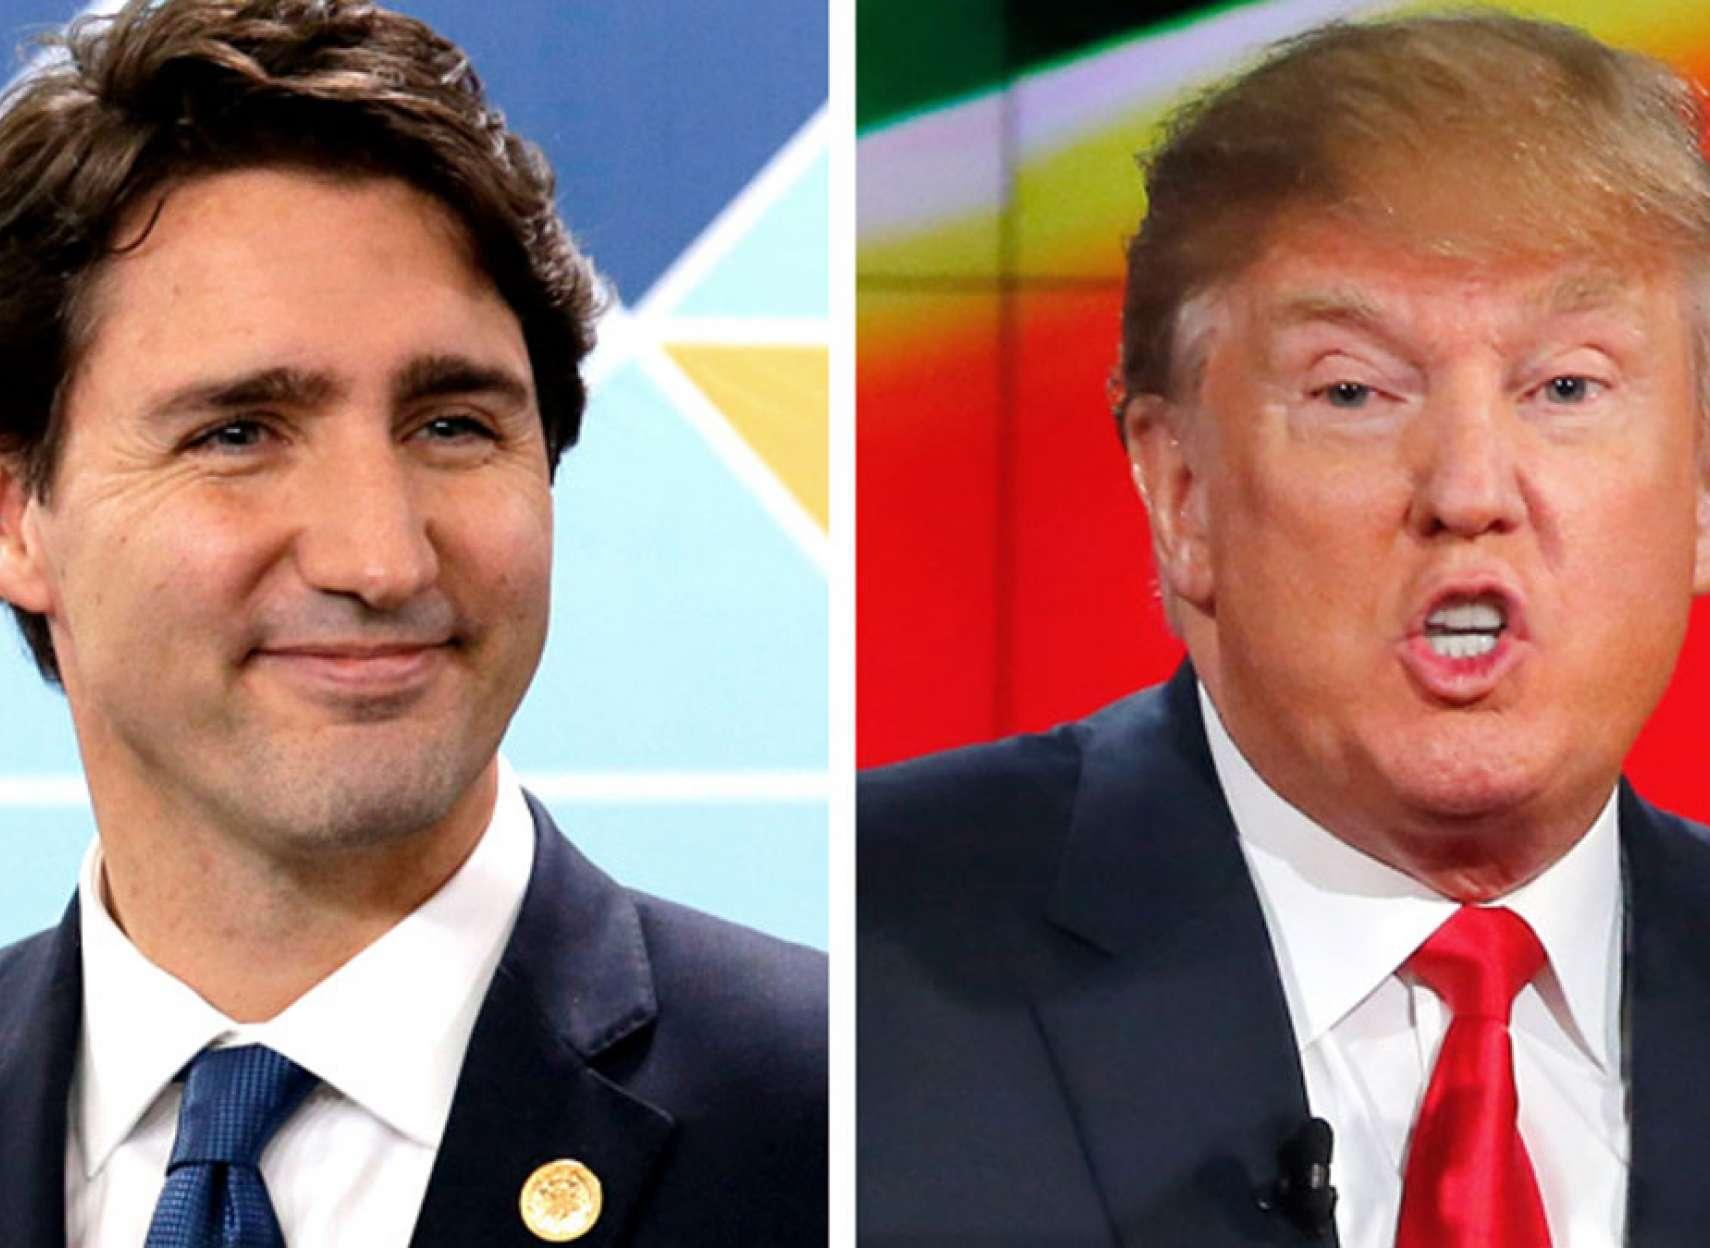 اخبار-کانادا-مقابل-جنگ-گمرکی-آمریکا-مقابله-به-مثل-می-کنیم-انتاریو-کالای-کانادایی-می-خریم